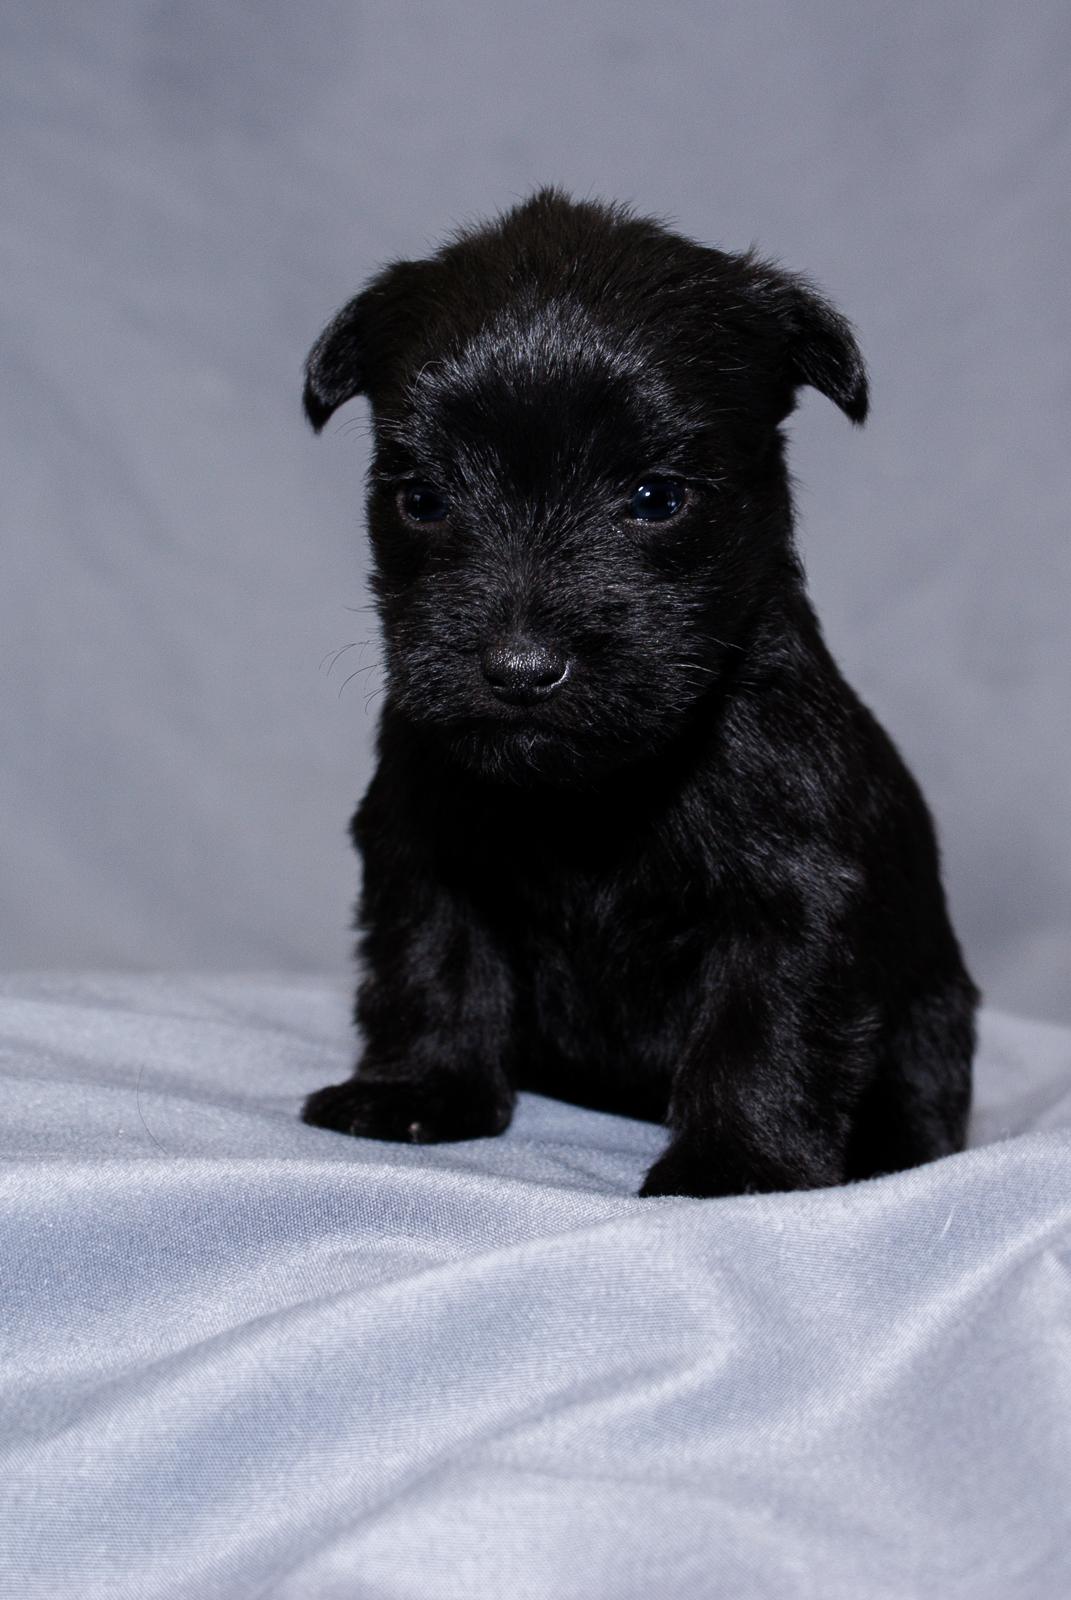 Distinguished Sale Female Black Schnauzer Yorkie Pup Female Black Schnauzer Yorkie Pup By Drop Schnauzer Yorkie Mix Black Schnauzer Yorkie Mix Puppy bark post Schnauzer Yorkie Mix